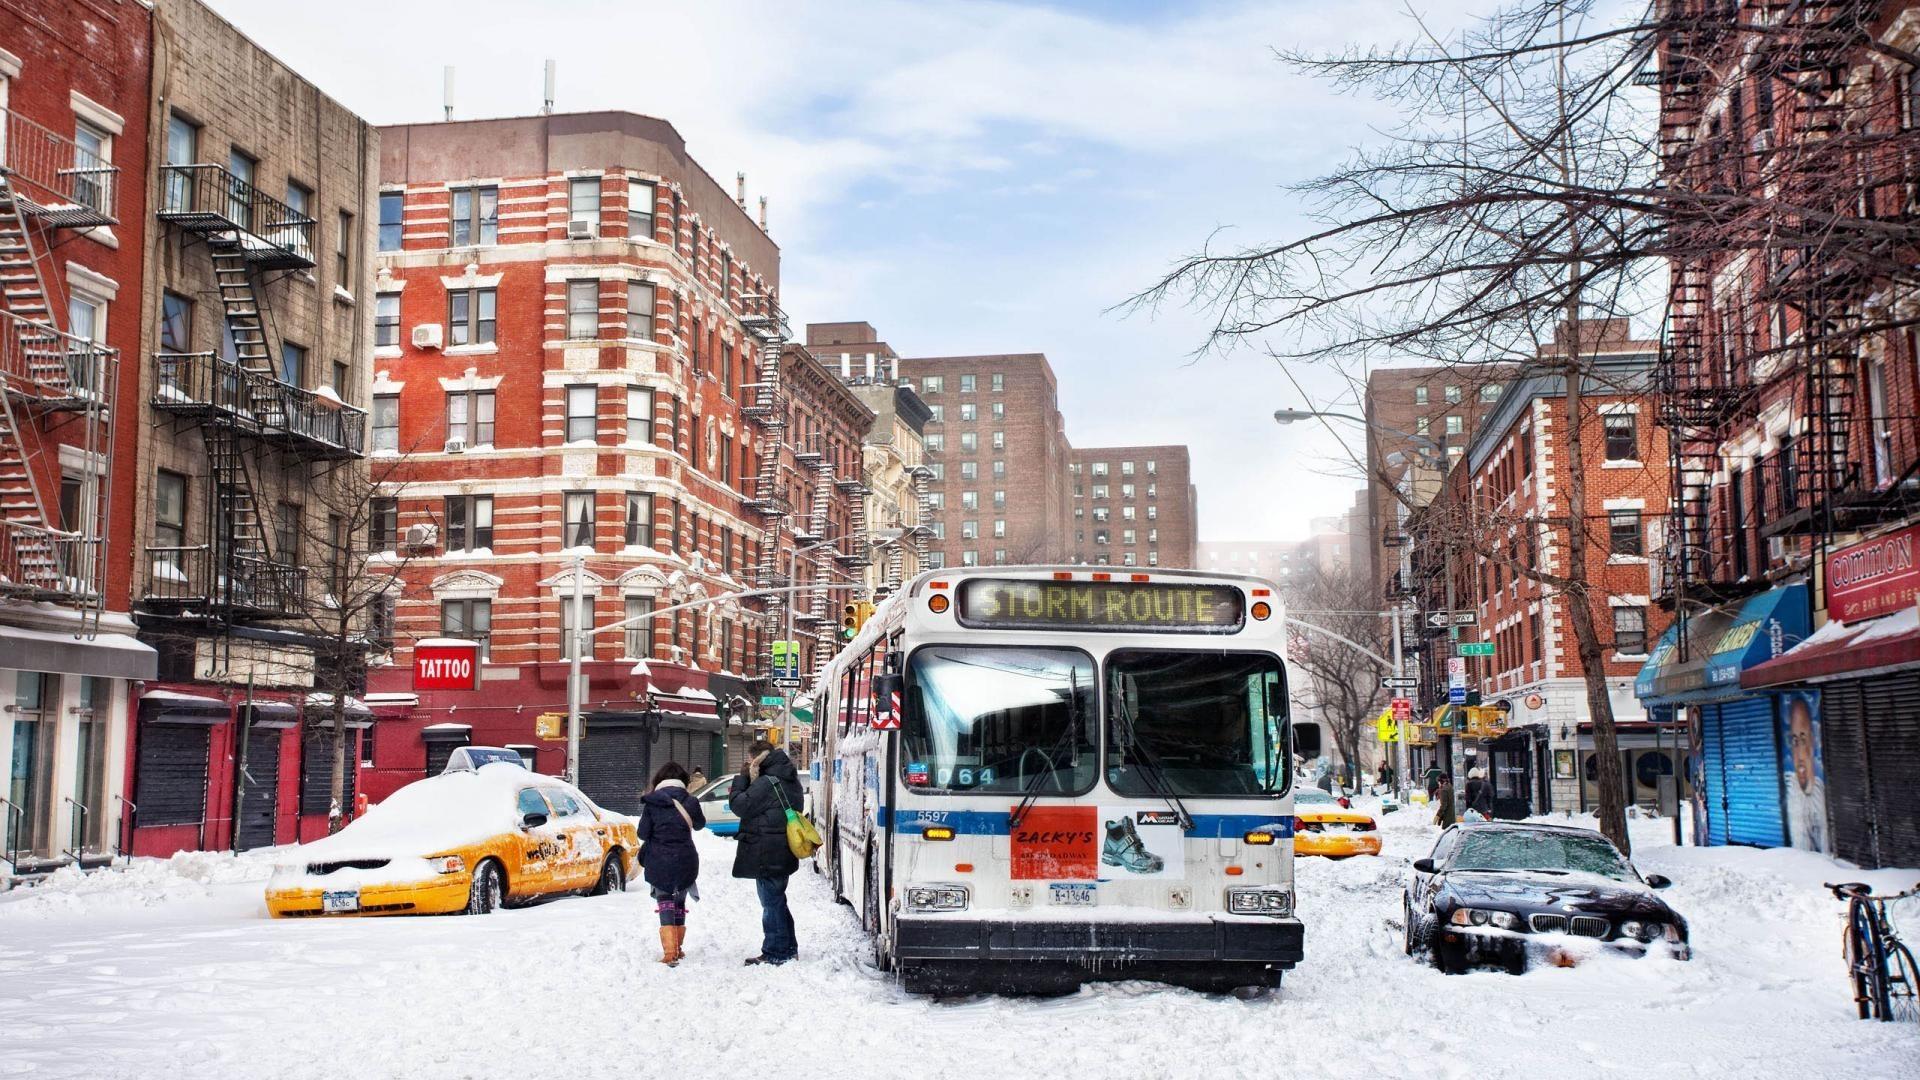 Hard Winter Bus Street City New York USA Wallpaper Free – 1920×1080